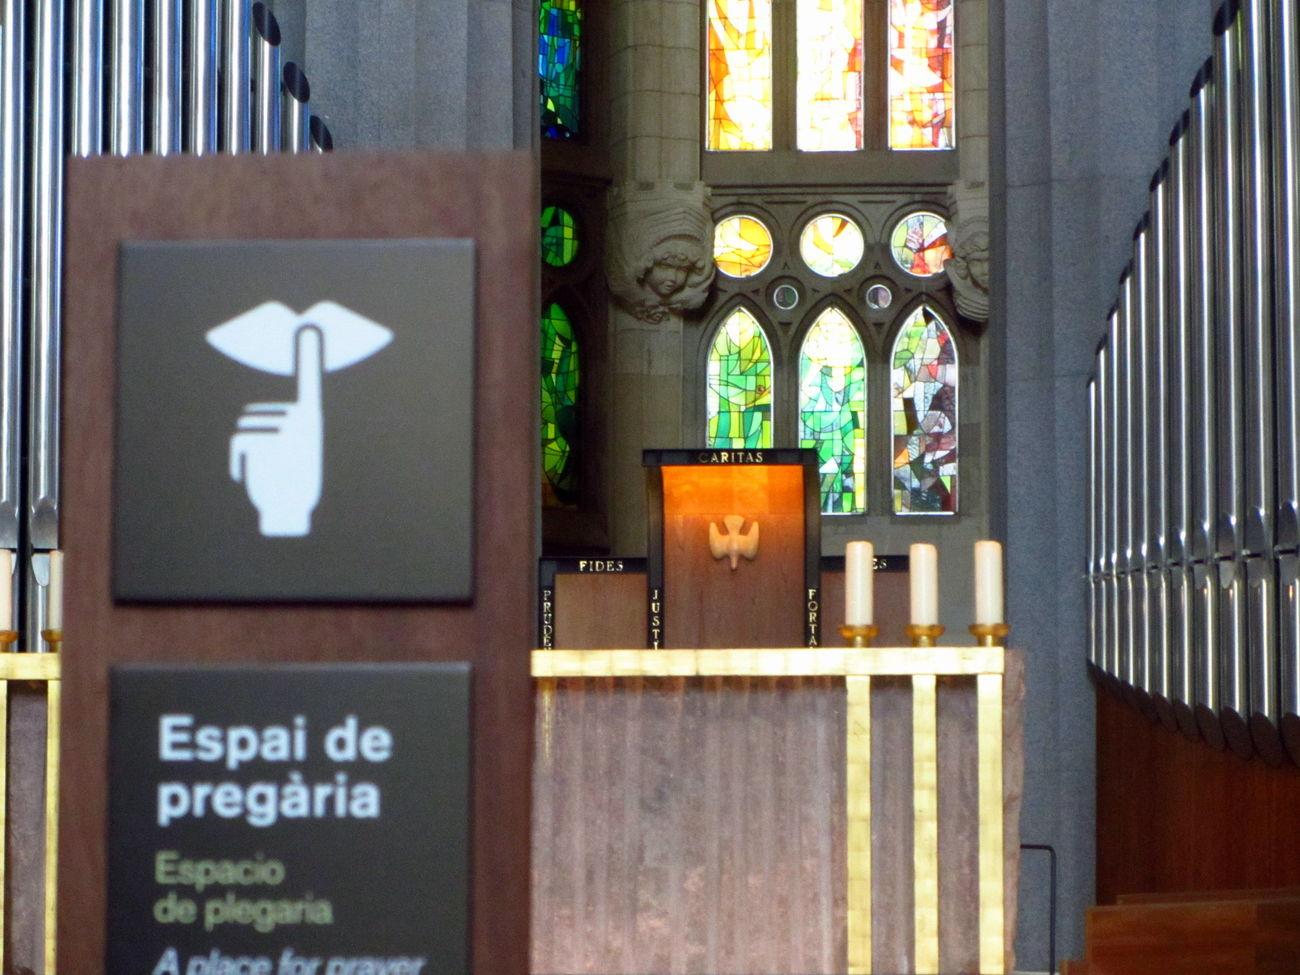 Space for praying Art Barcelona Barcelonalove Cathedral Church España Gaudi Indoors  Meditation Mosaico No People Praying Sacred Sagrada Familia Shhhhhhhhhhh.... Silence SPAIN